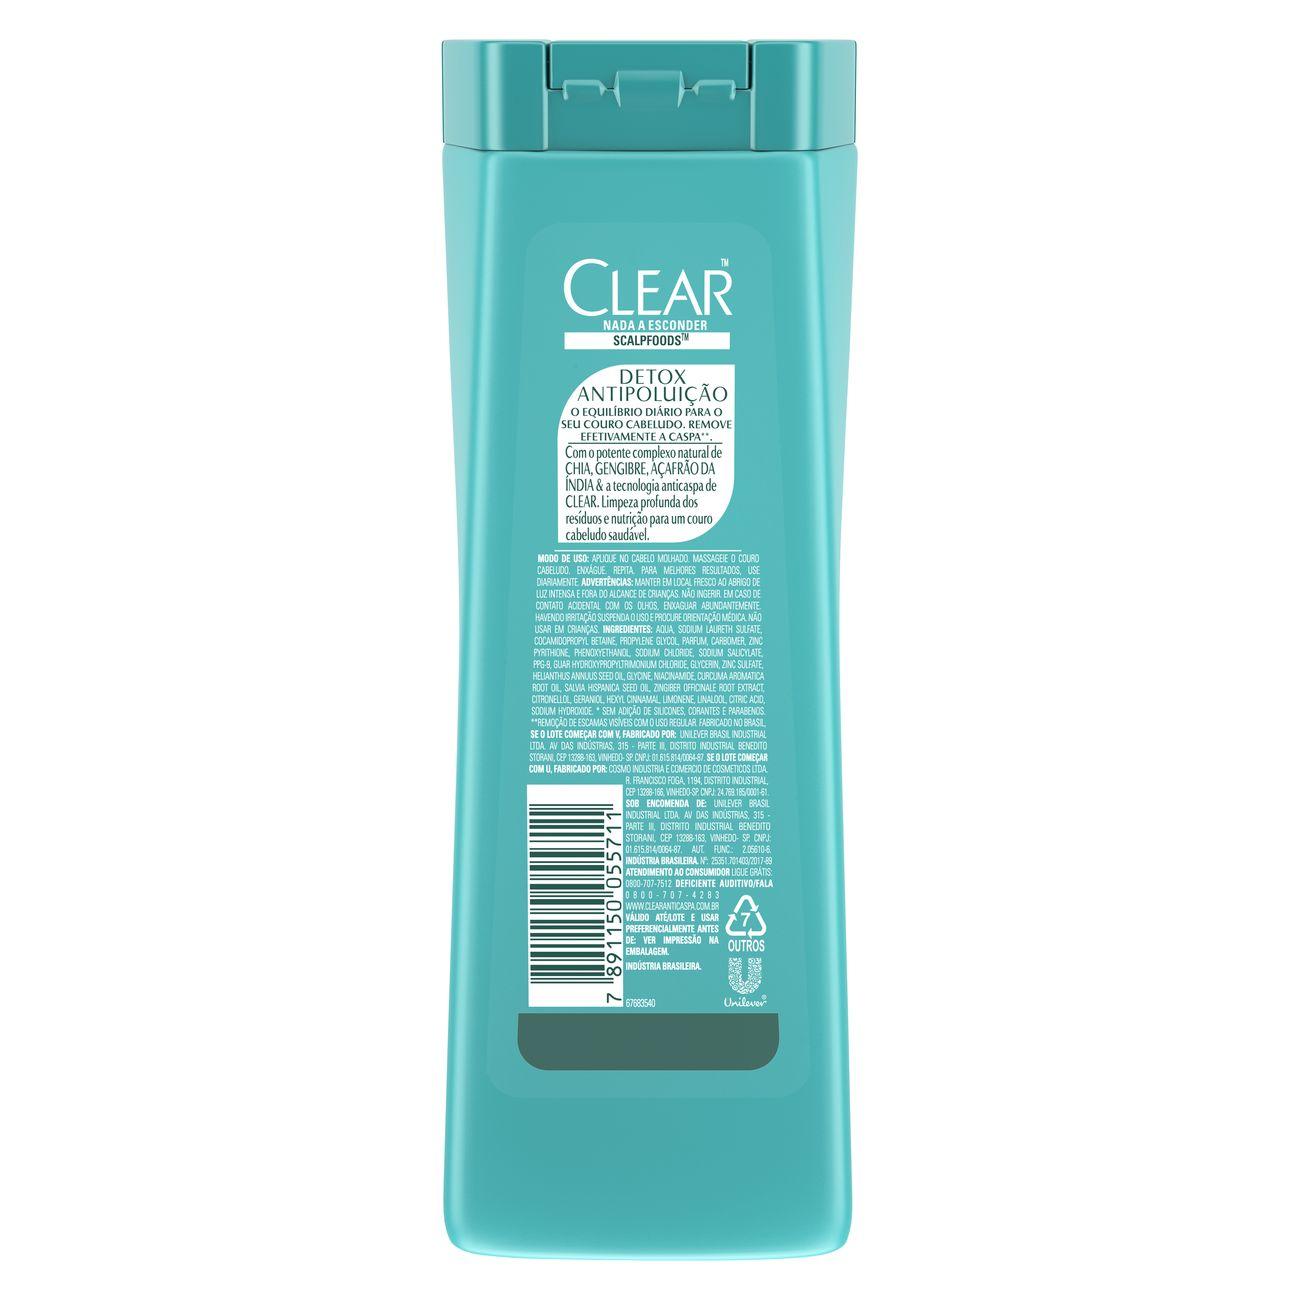 Shampoo Anticaspa Clear Detox Polui��o 200ml